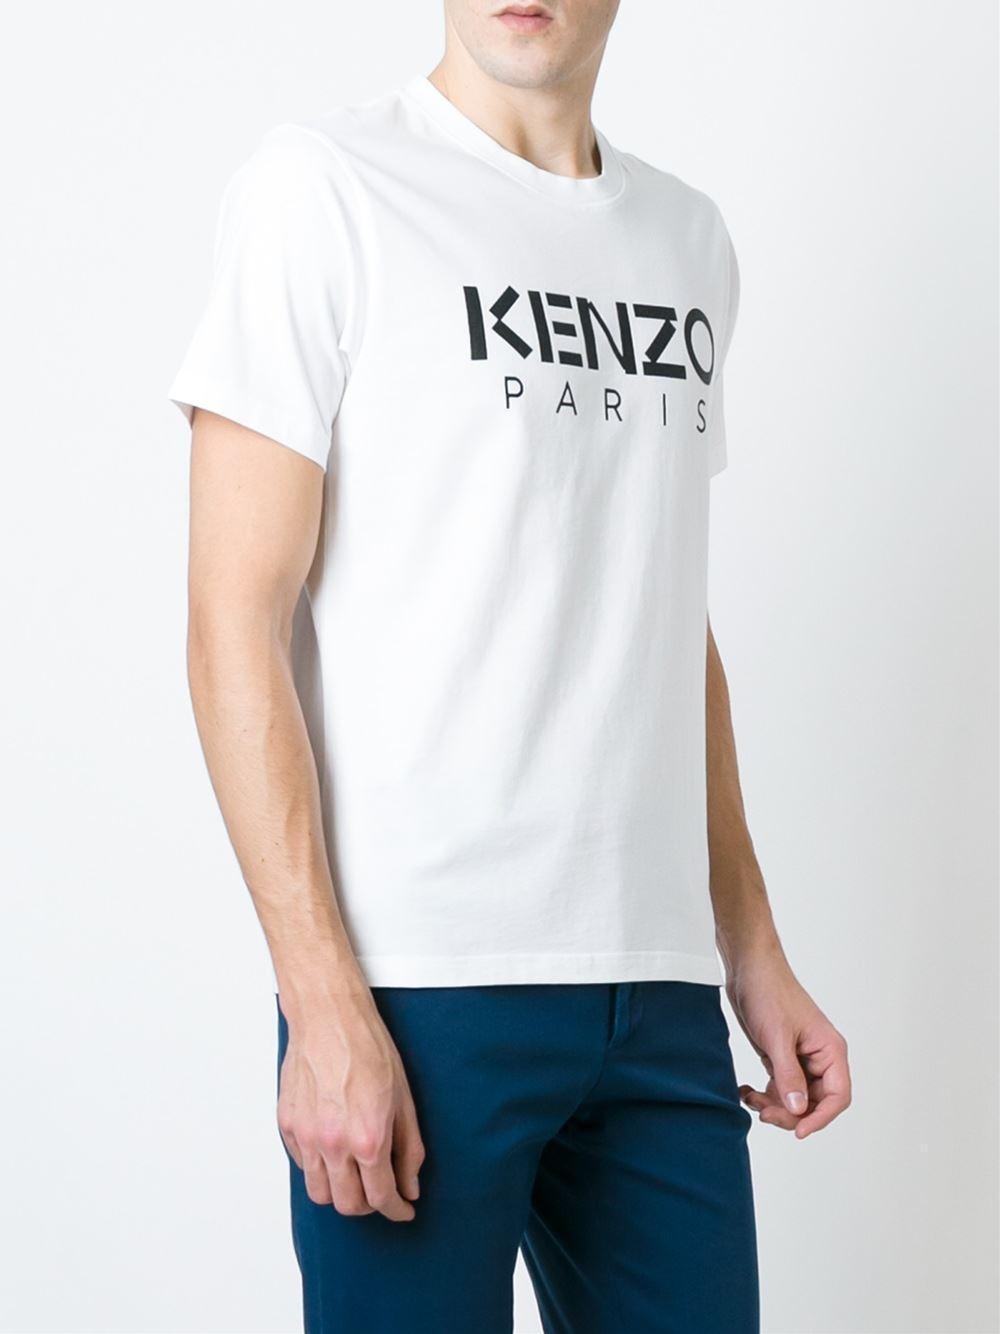 kenzo paris t shirt men cotton m in white for men lyst. Black Bedroom Furniture Sets. Home Design Ideas